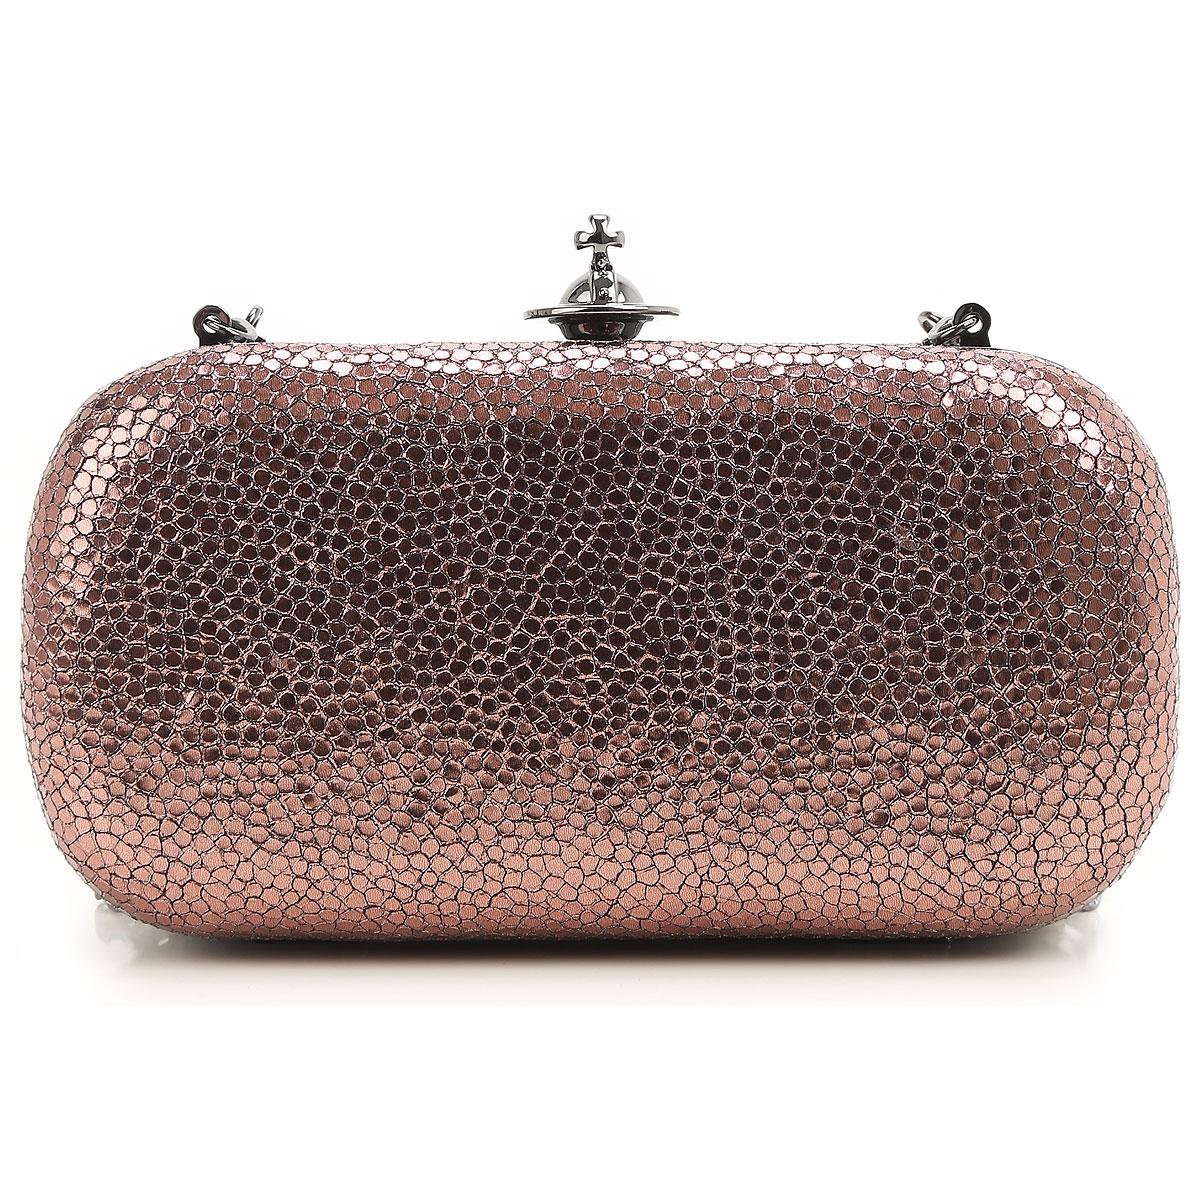 Vivienne Westwood Clutch Bag, Dark Burnt Pink, Leather, 2019